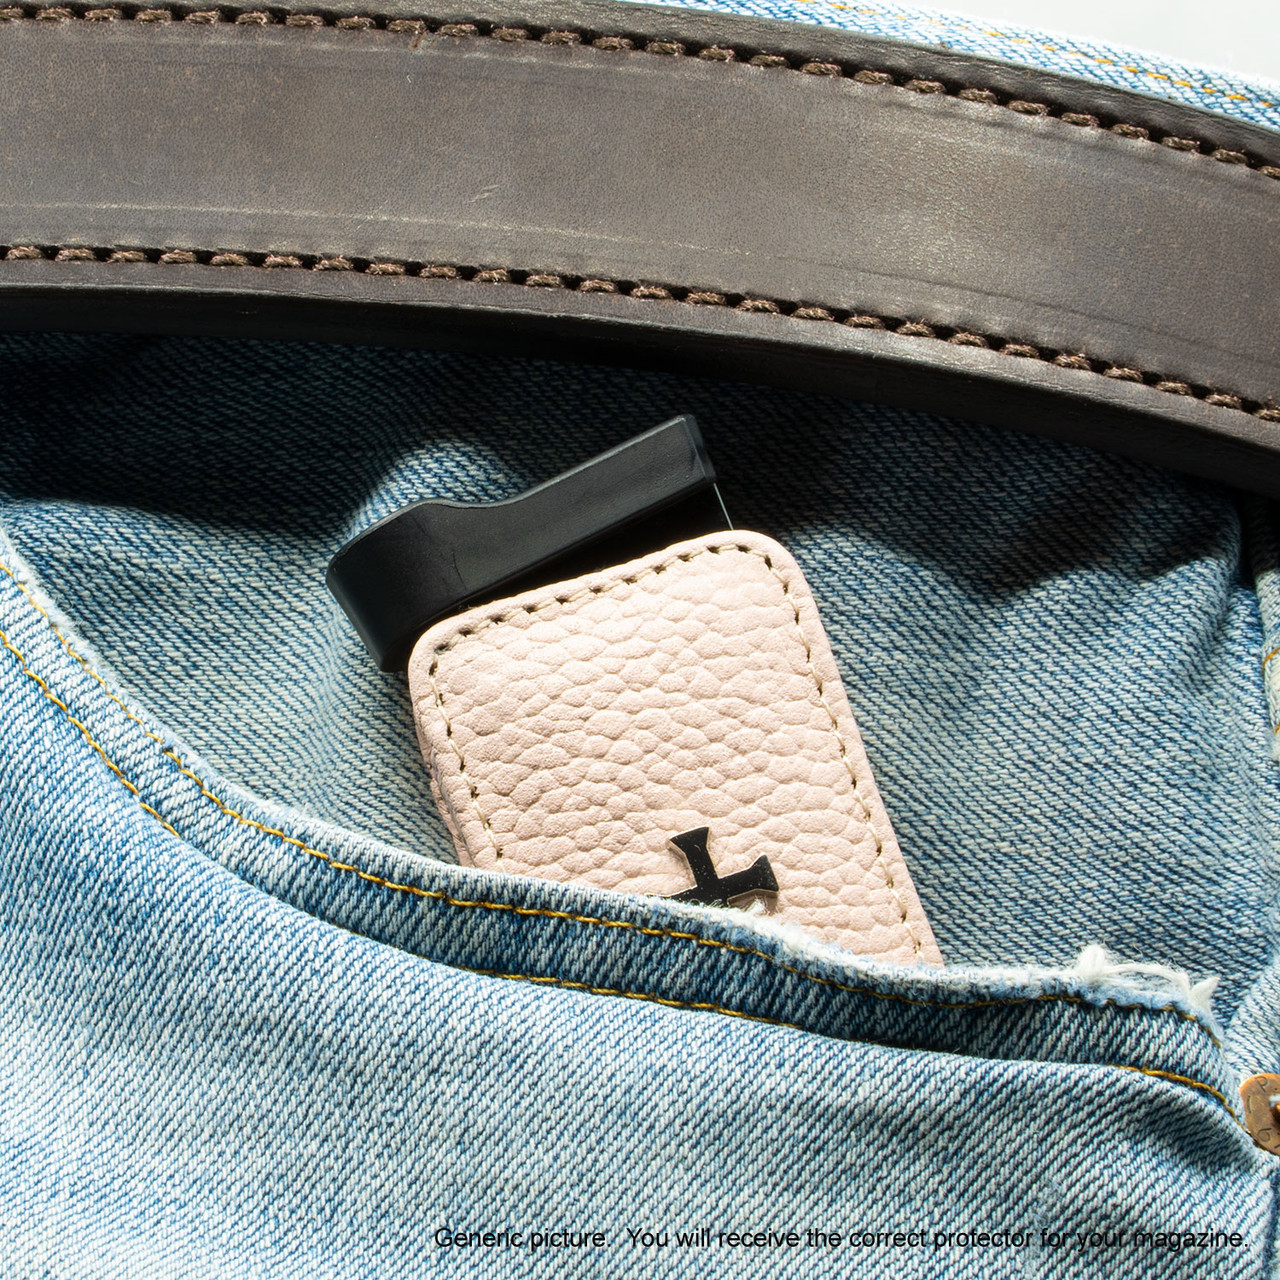 CZ 75D Compact Pink Carry Faithfully Cross Magazine Pocket Protector